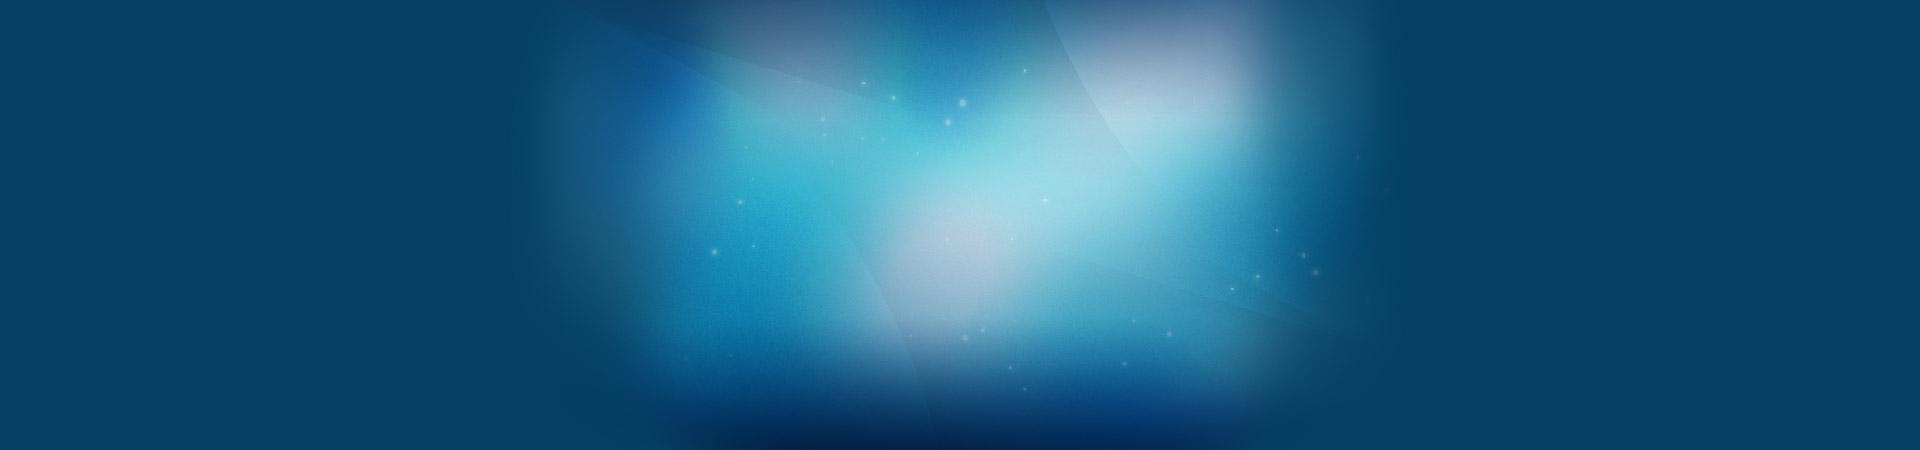 background-blue-1